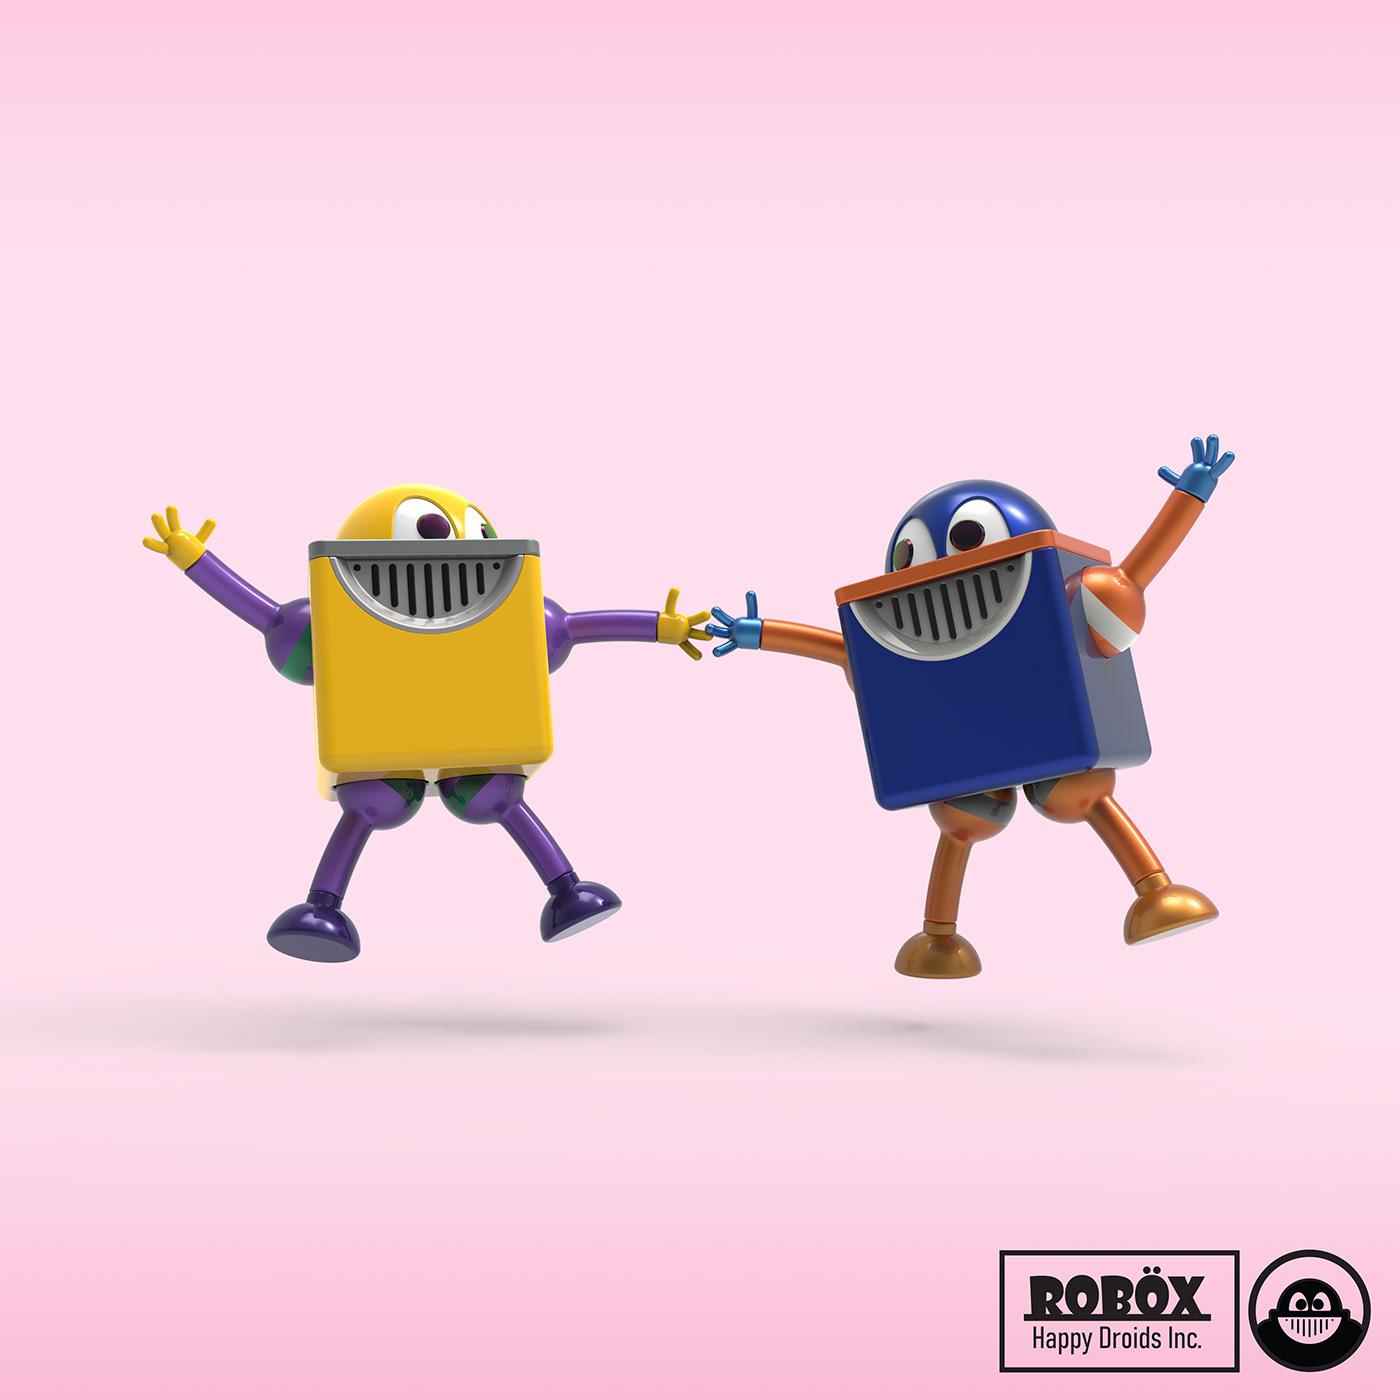 droid friendship happy industrial design  robot robotdesign   toy design